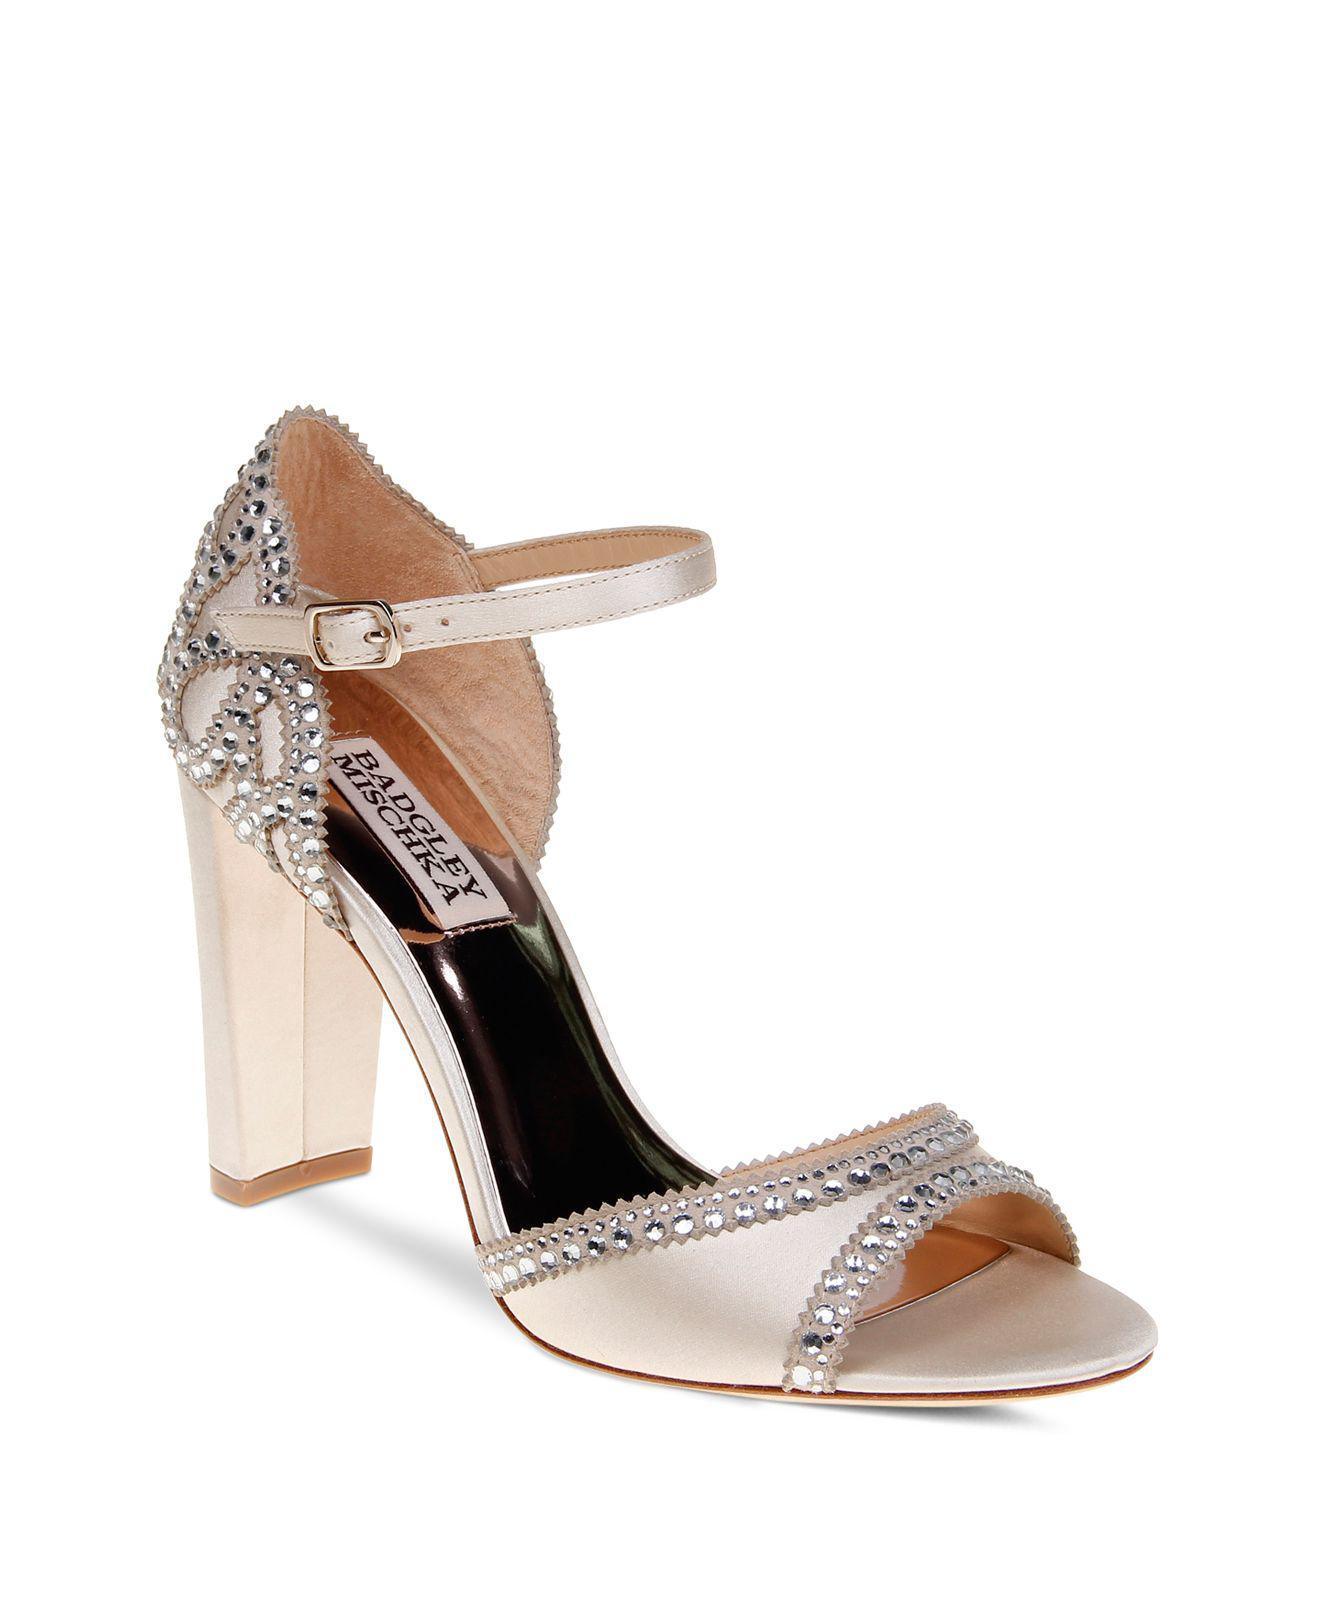 Badgley Mischka Kelly Embellished Suede High-Heel Sandals DWPPRDcJem